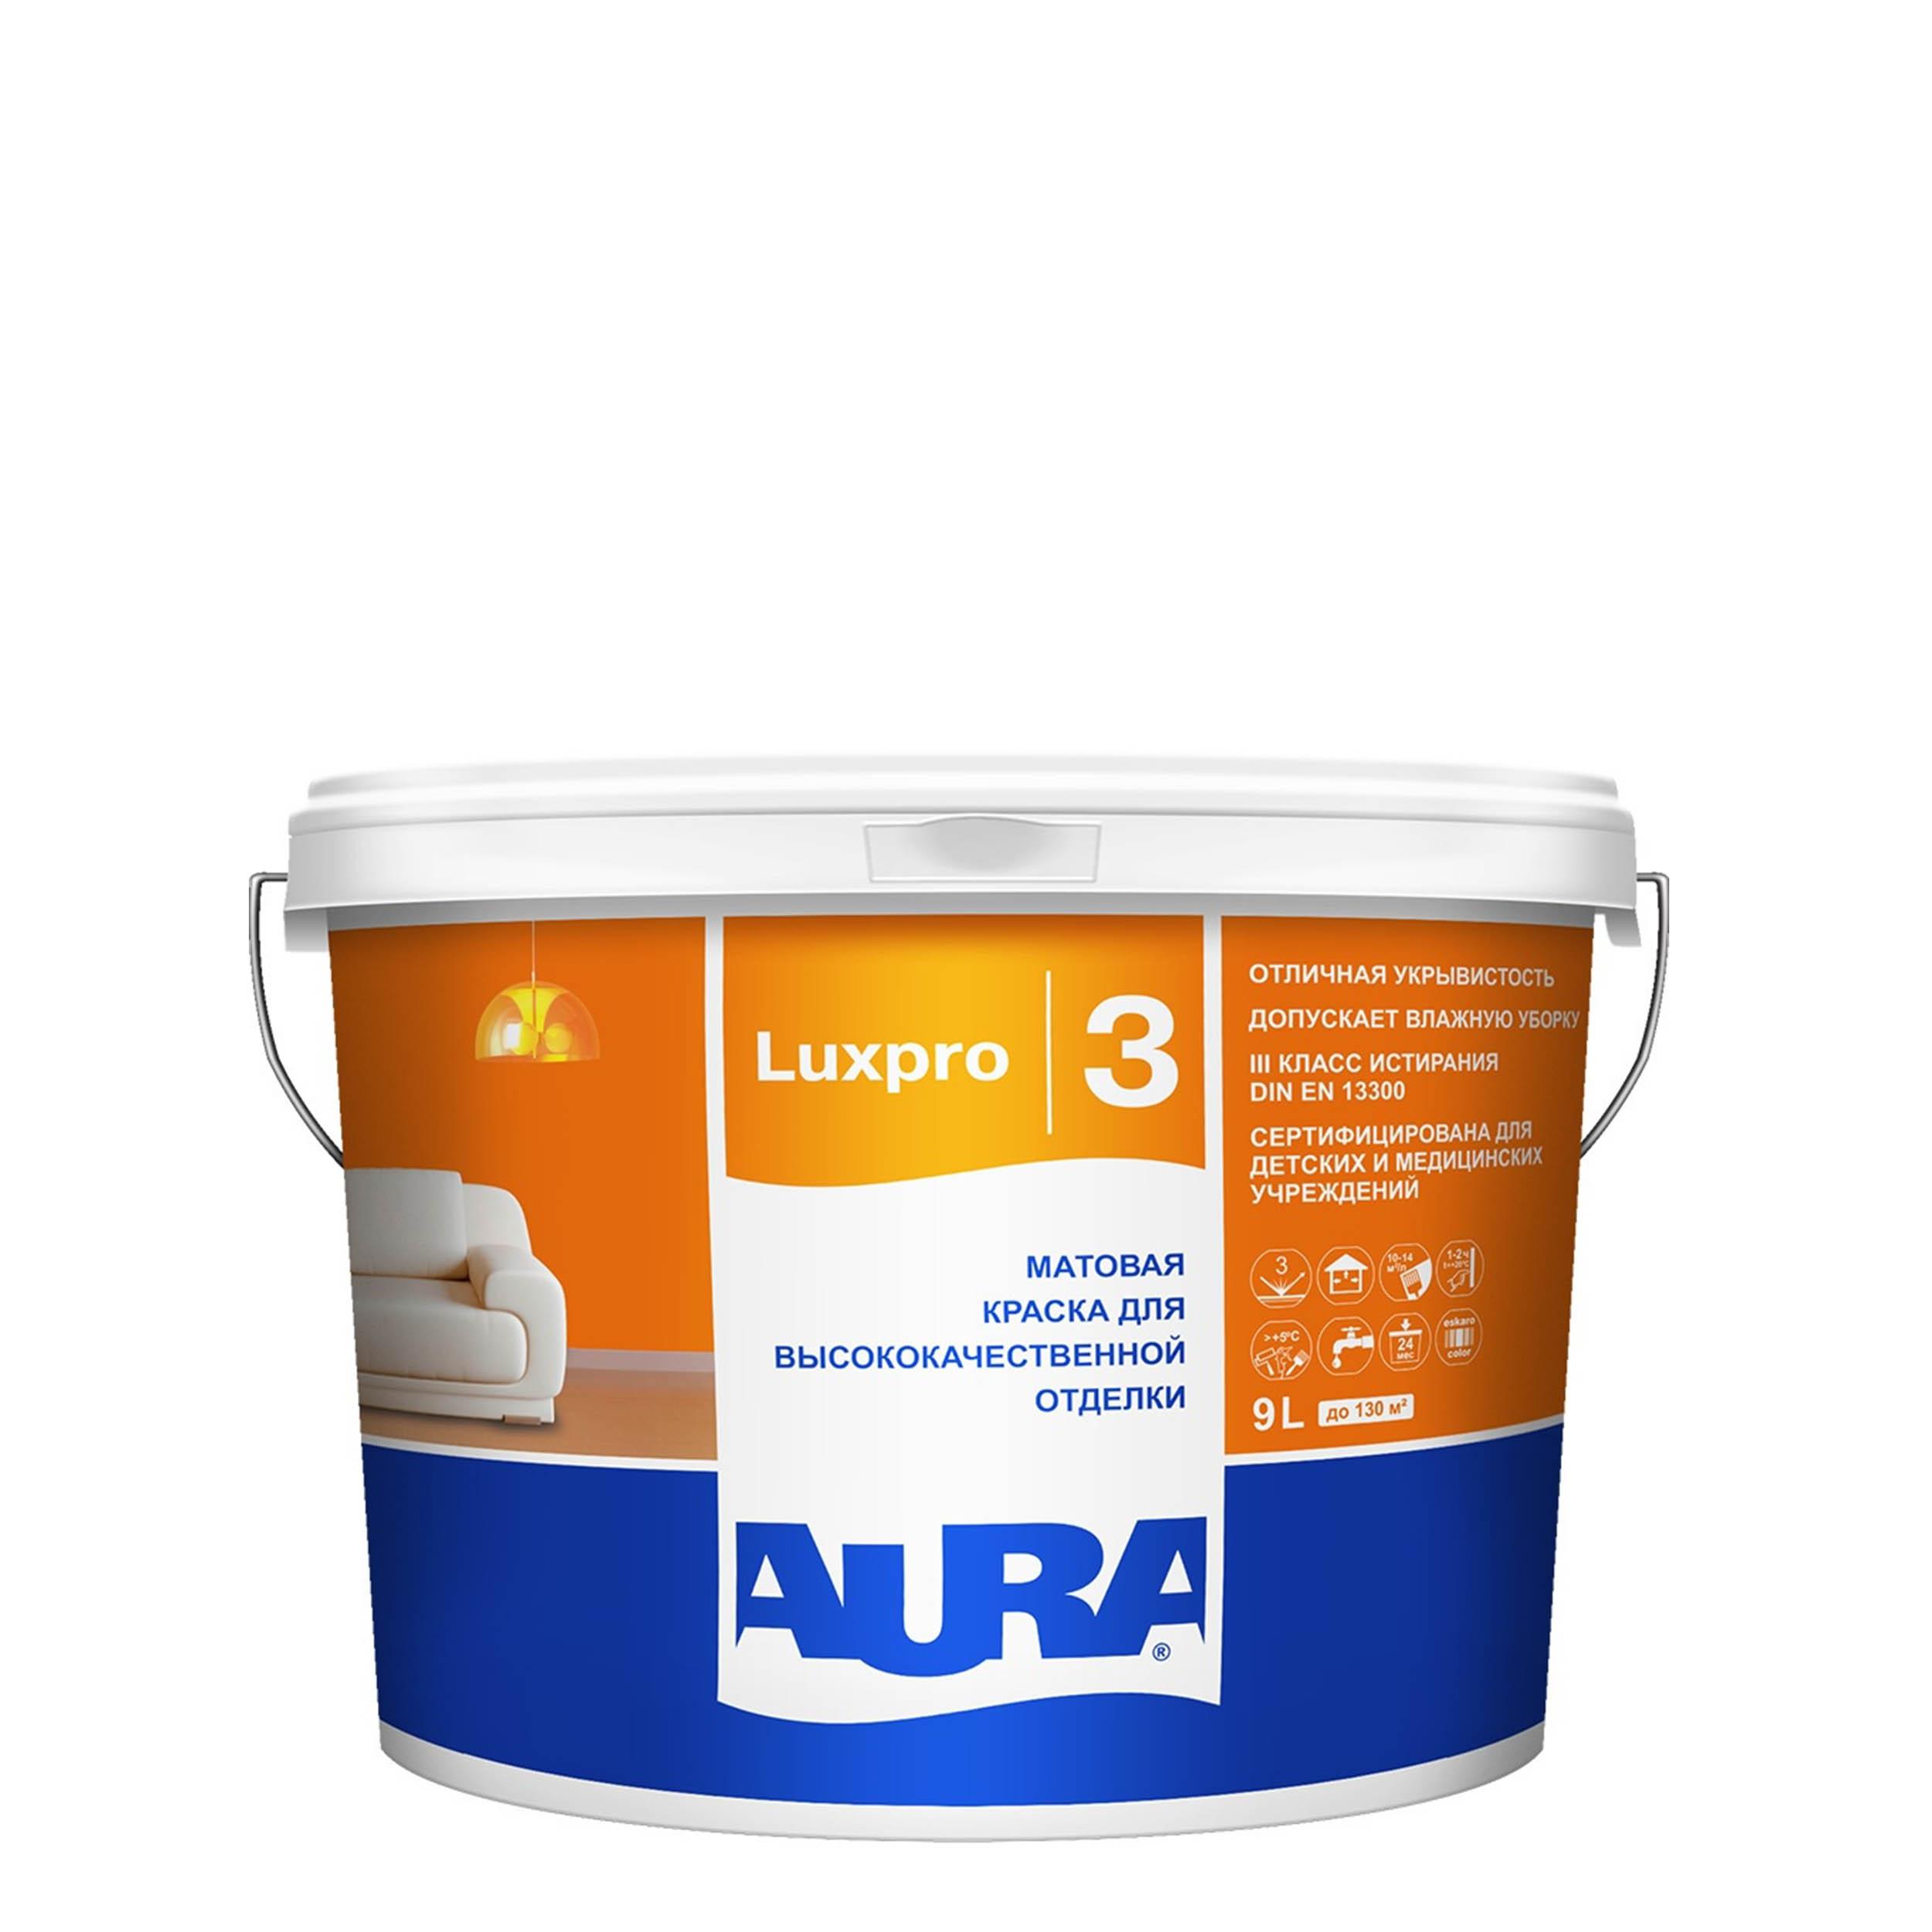 Фото 4 - Краска интерьерная, Aura LuxPRO 3, RAL 4009, 11 кг.